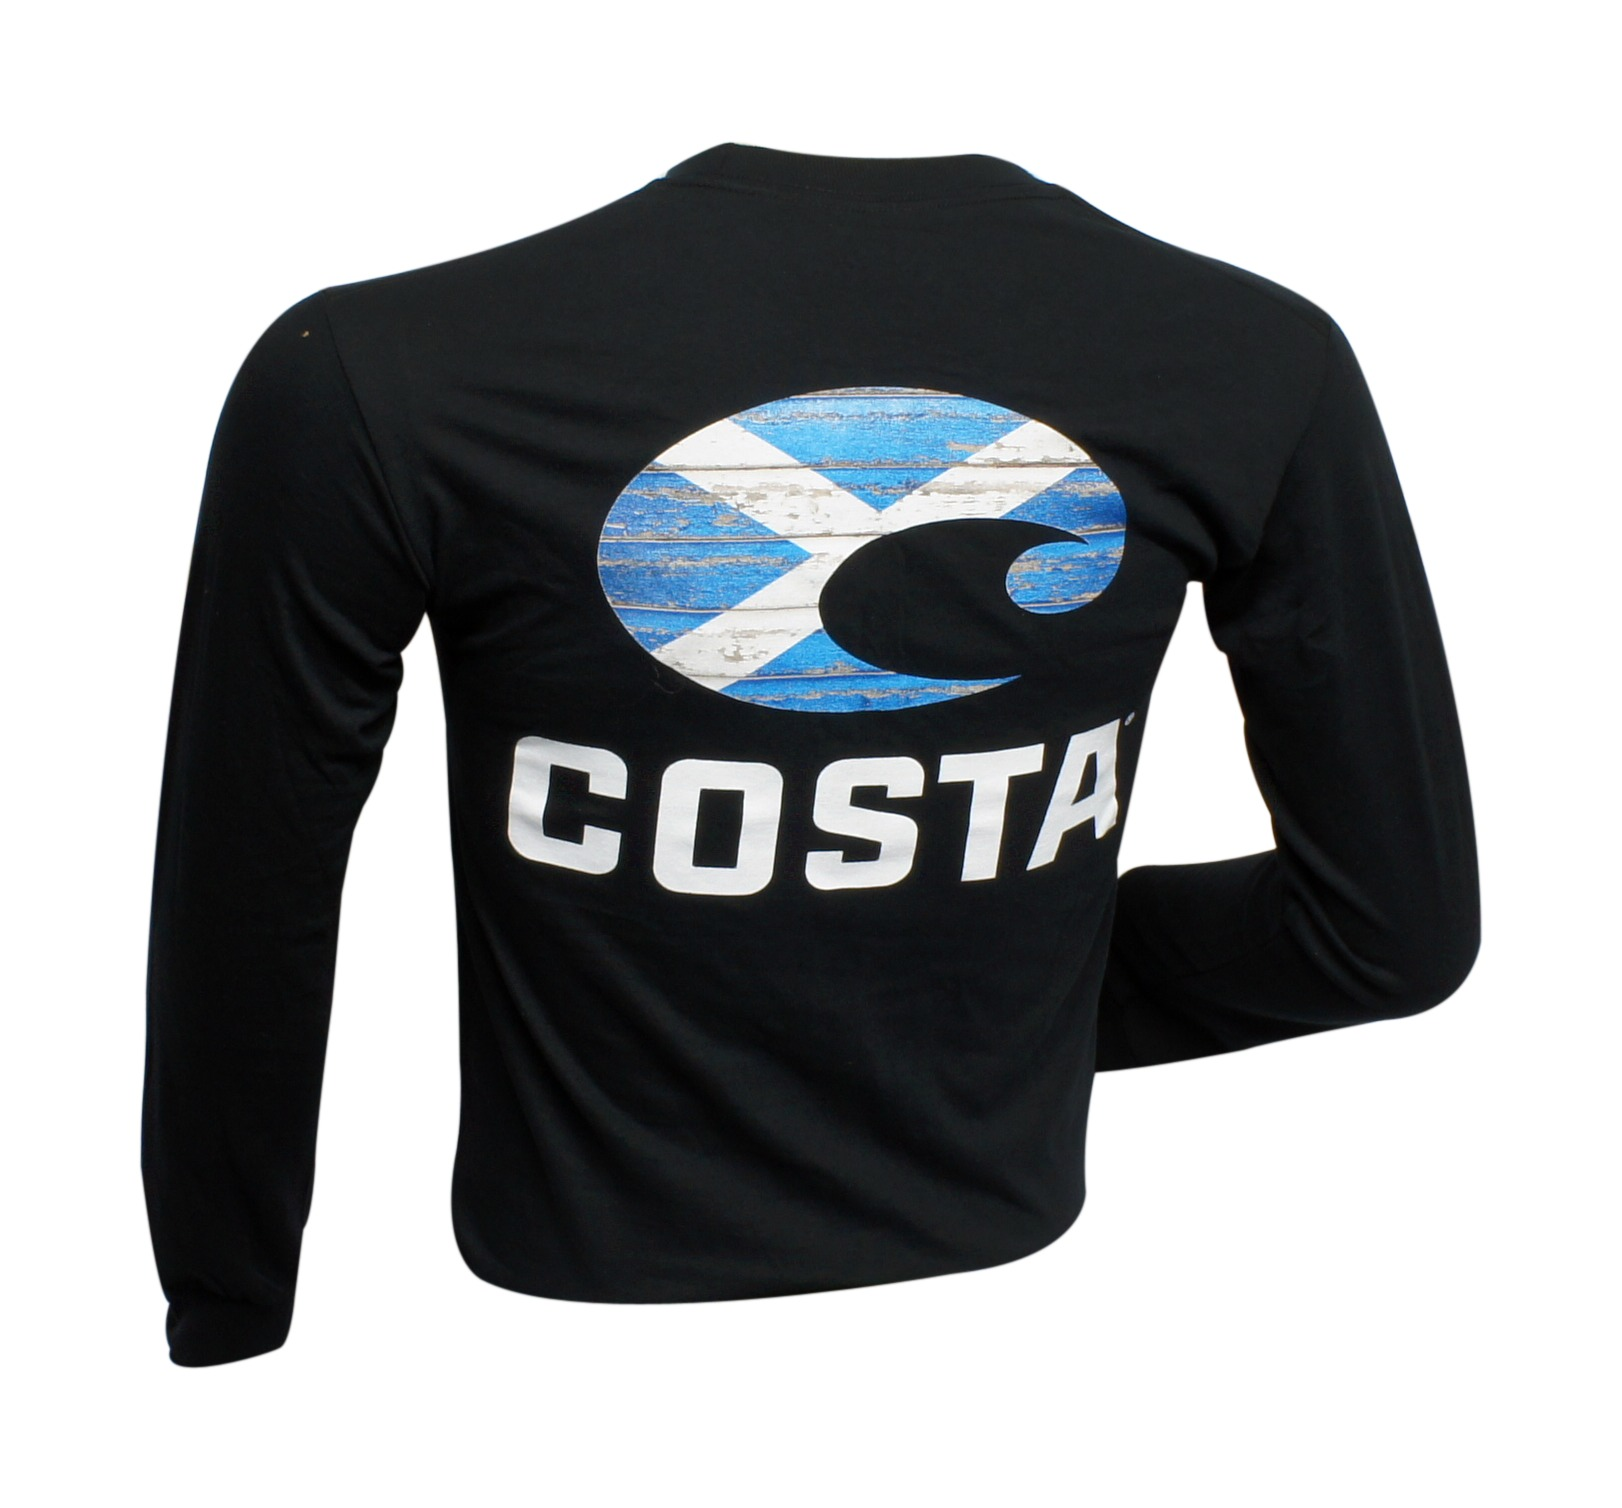 Costa del mar saltire logo long sleeve t shirt glasgow for Costa fishing shirt